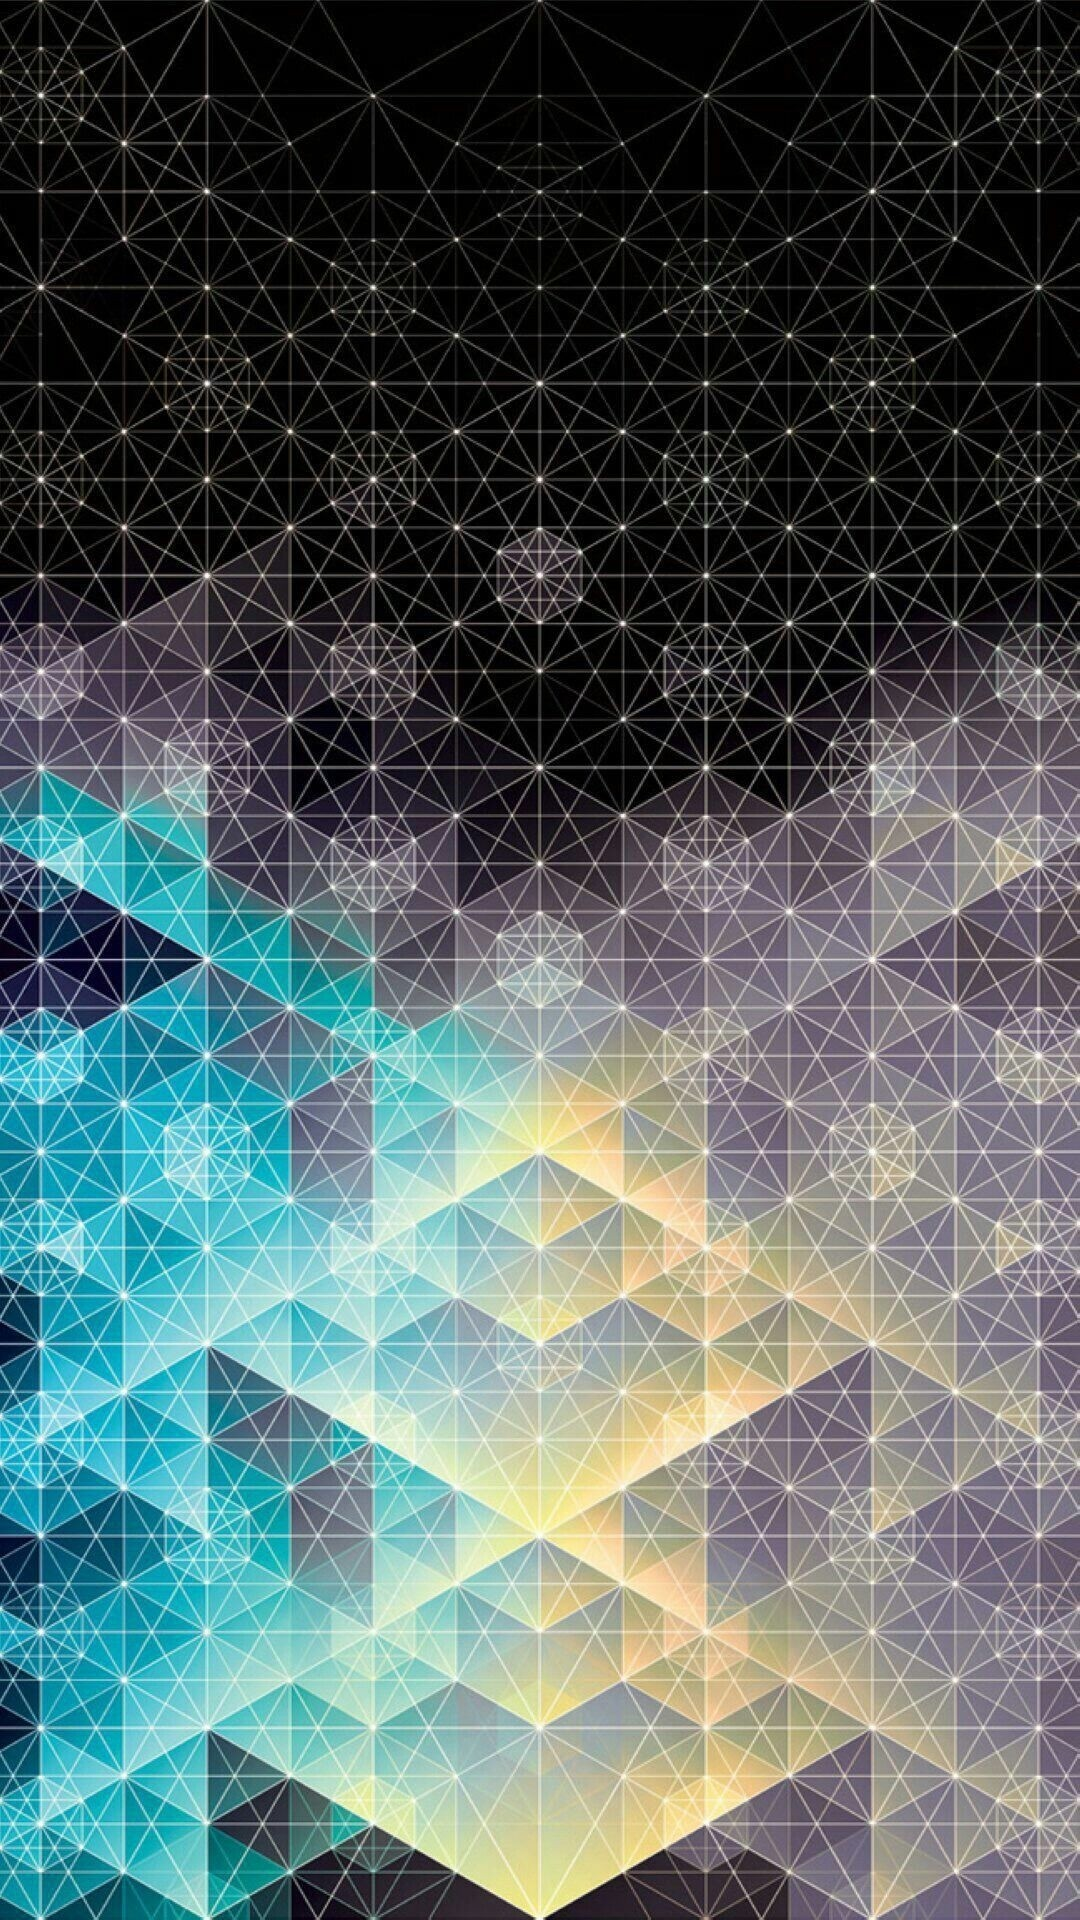 Geometric iphone 6s plus wallpaper